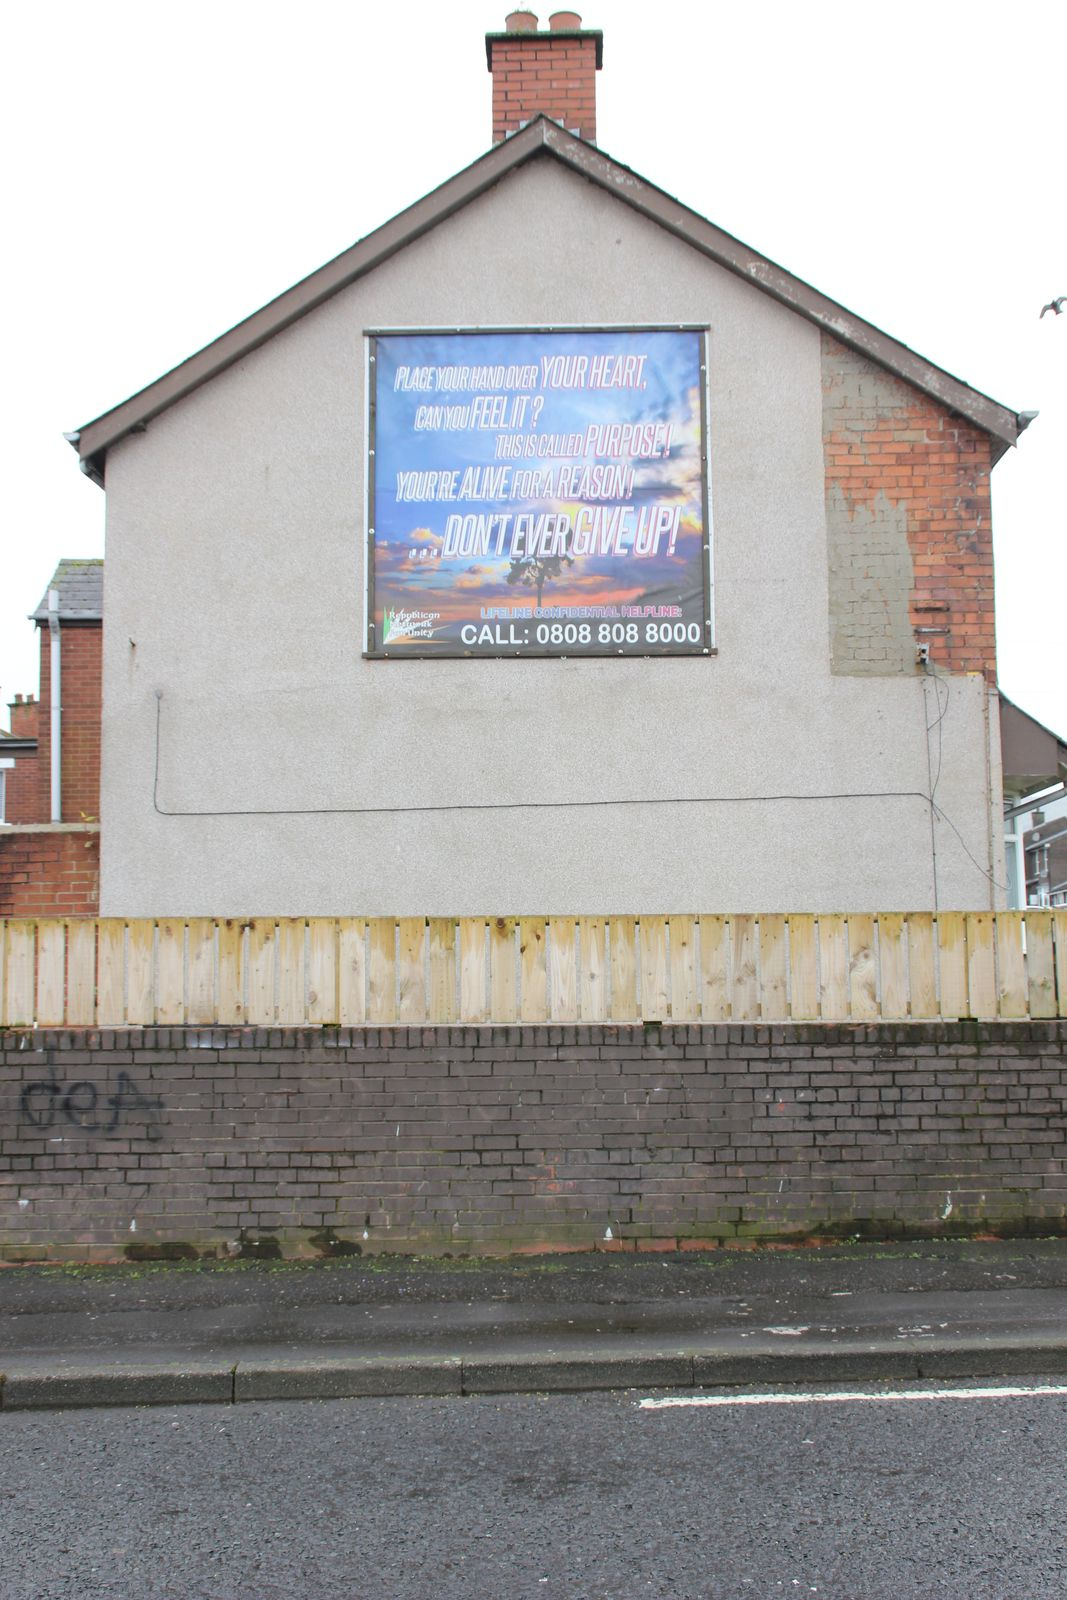 817) Berwick Road, Ardoyne, North Belfast